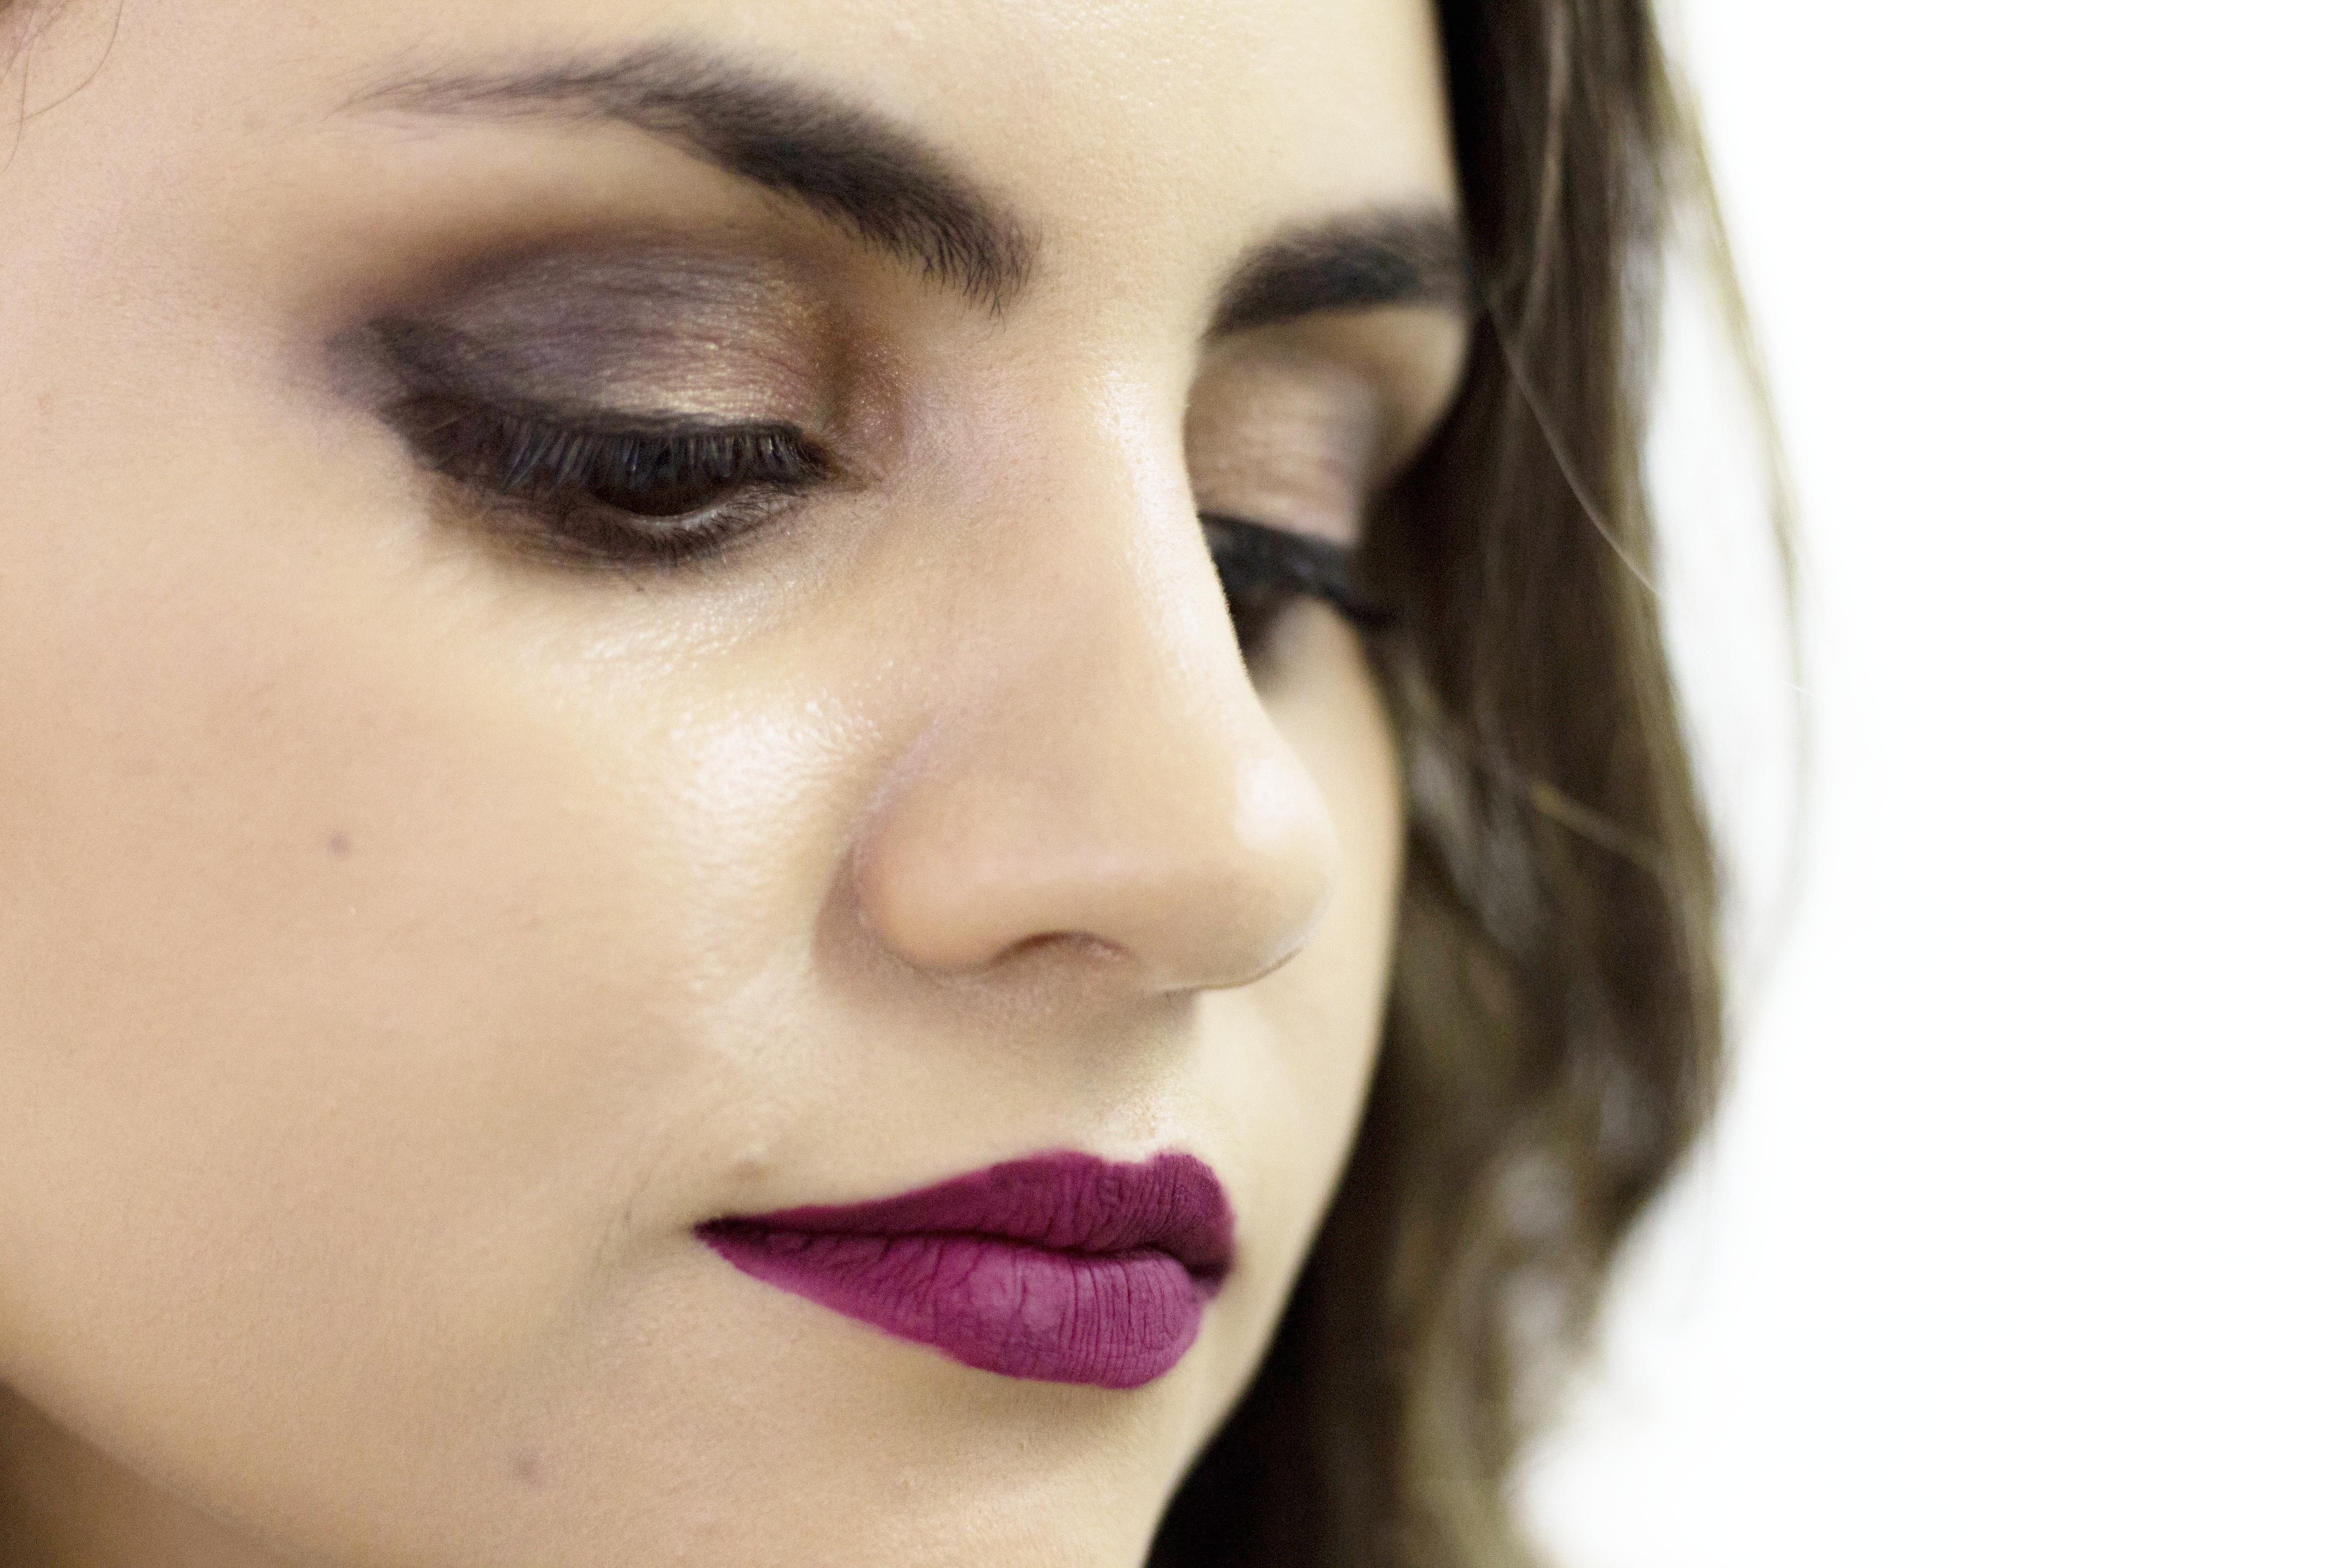 IMG_2046 Look da Ka: Saia Lápis + Kimono e makeup